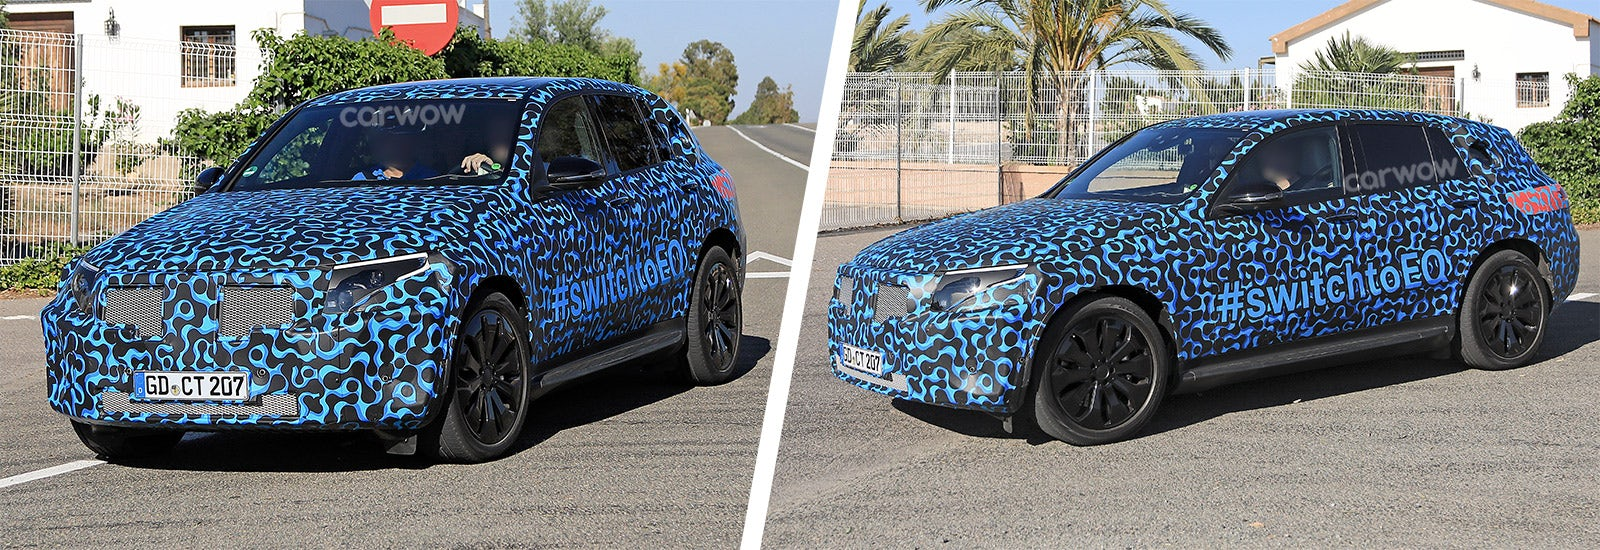 2019 Mercedes Benz Eqc Price Release Date Redesign Specs >> 2019 Mercedes EQ C SUV   price, specs and release date